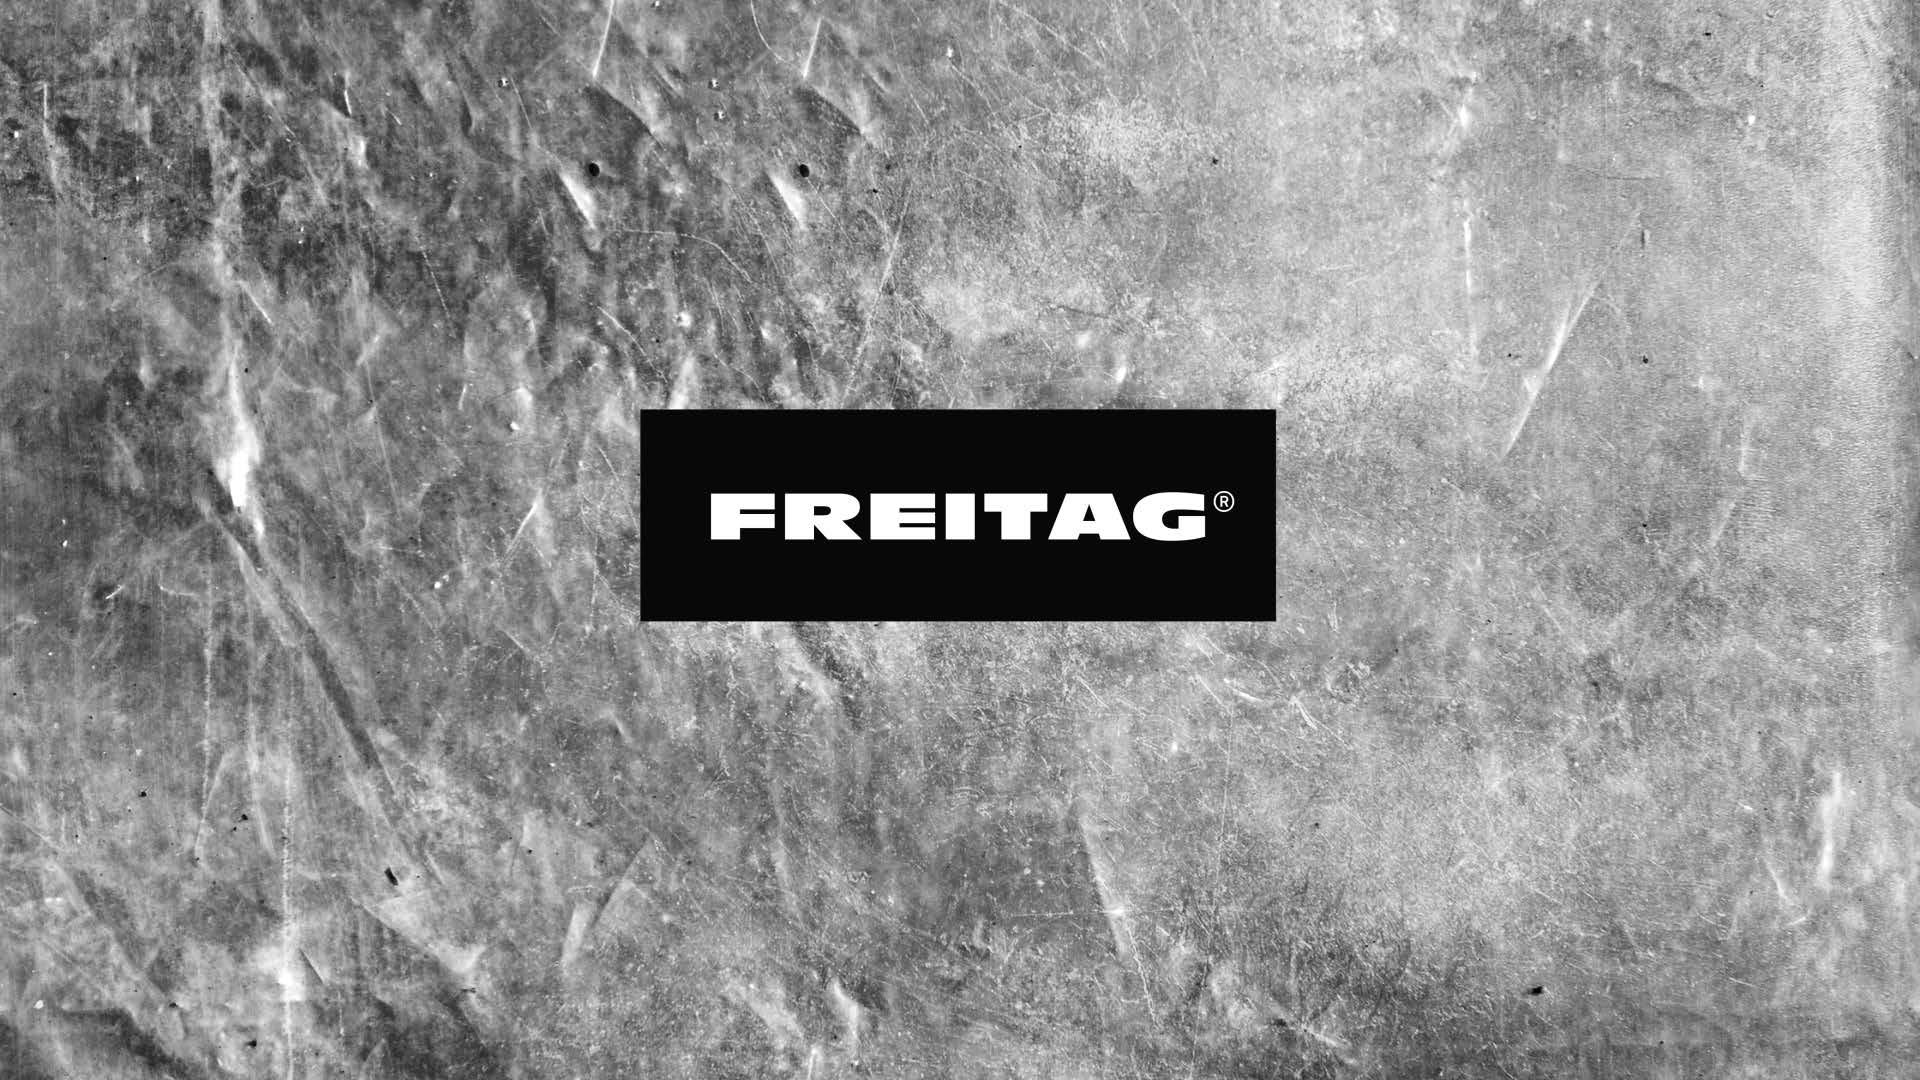 FREITAG_LOGO_PROCESS_Page_8.jpg